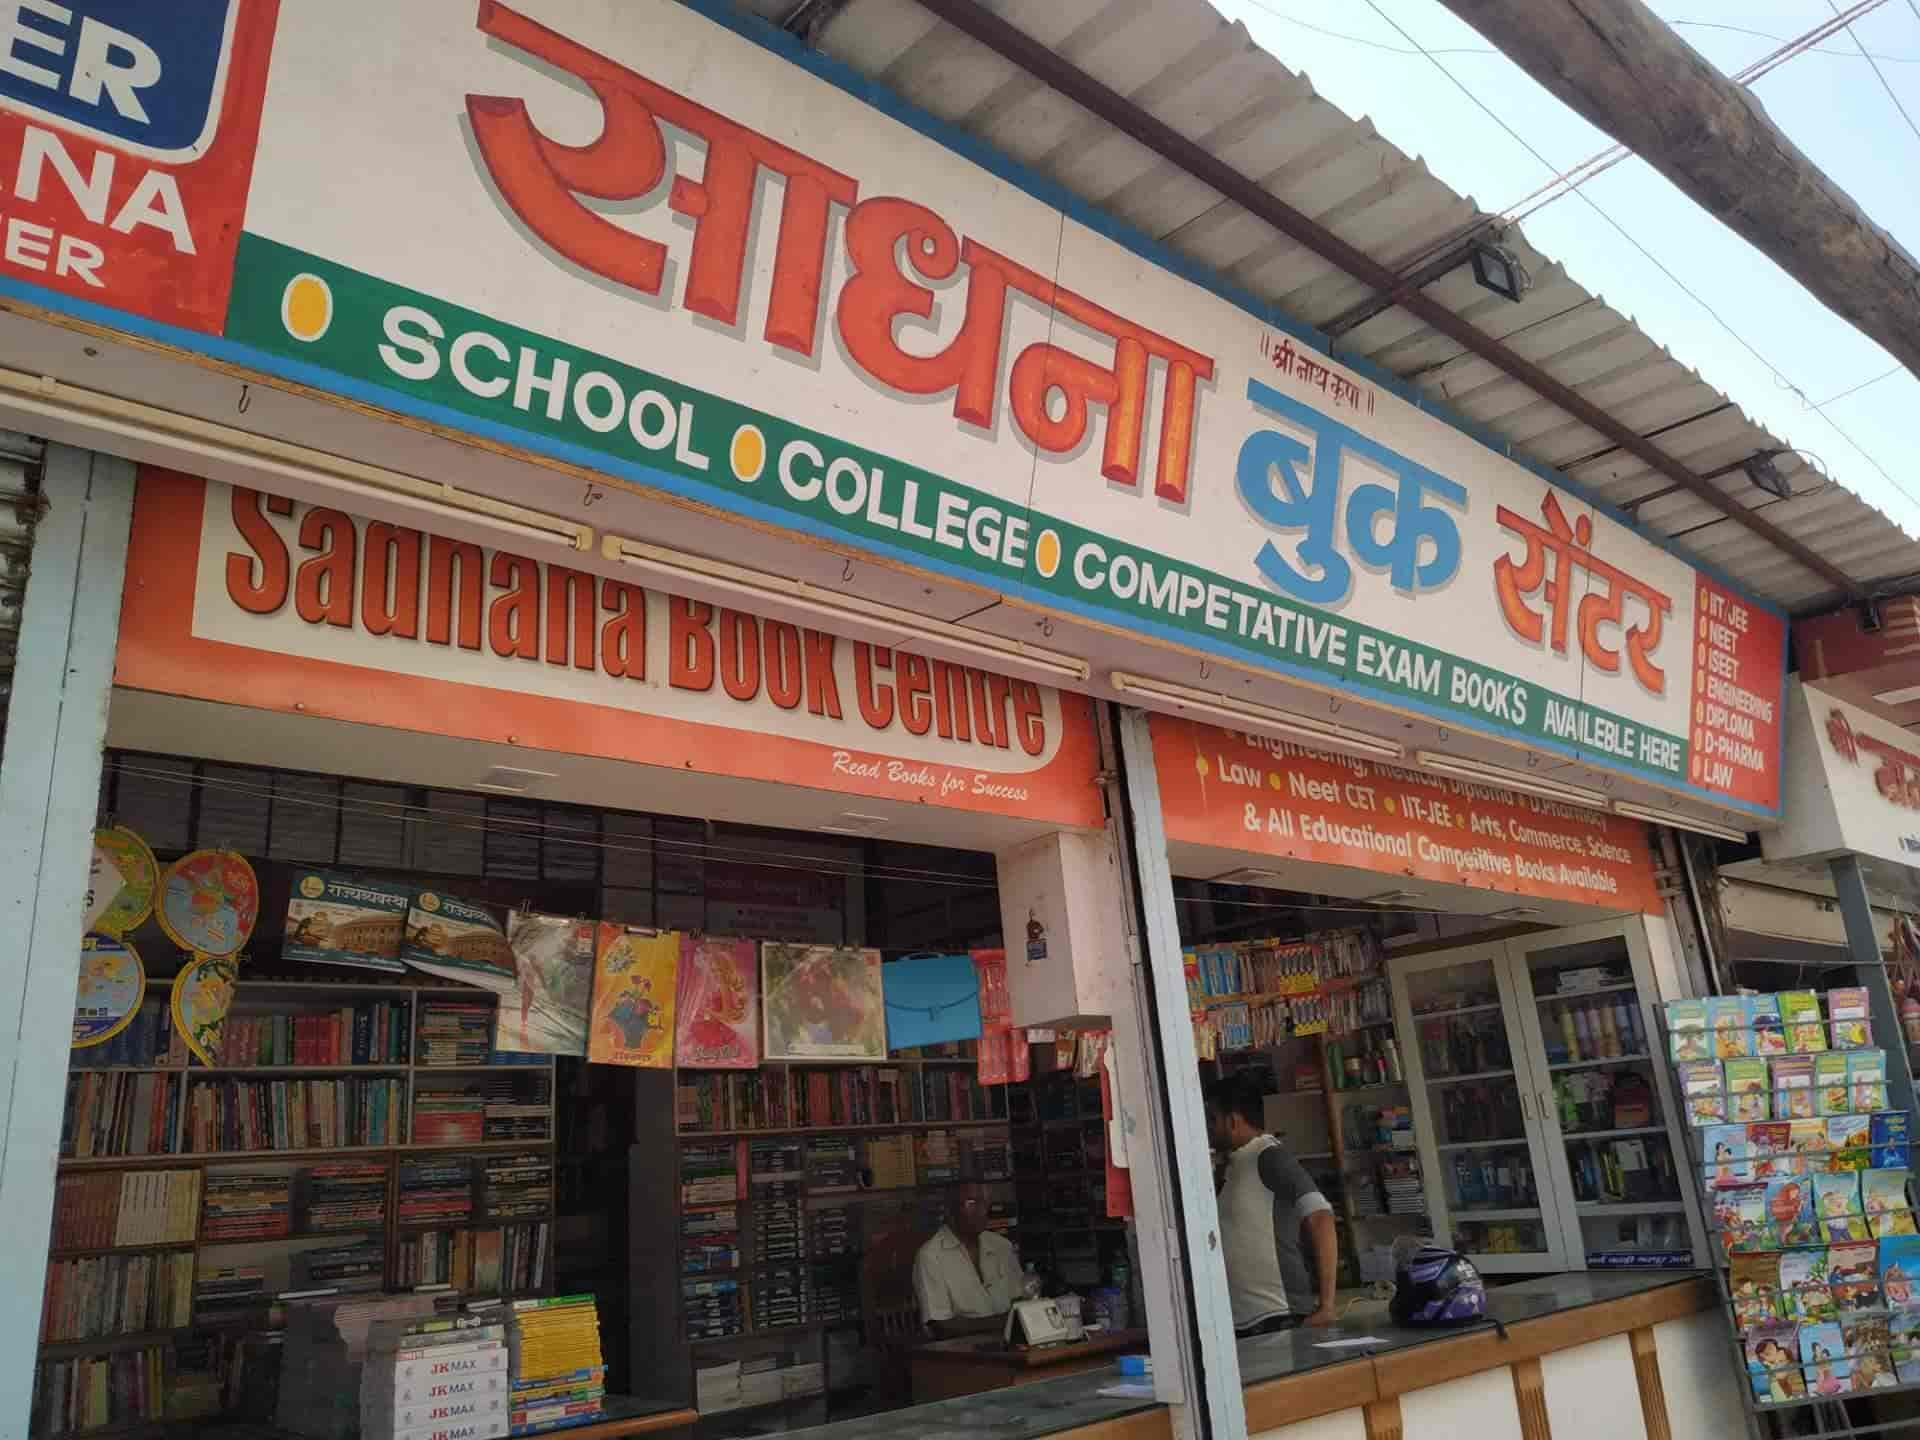 Sadhana Book Centre, Gulmandi - Book Shops in Aurangabad